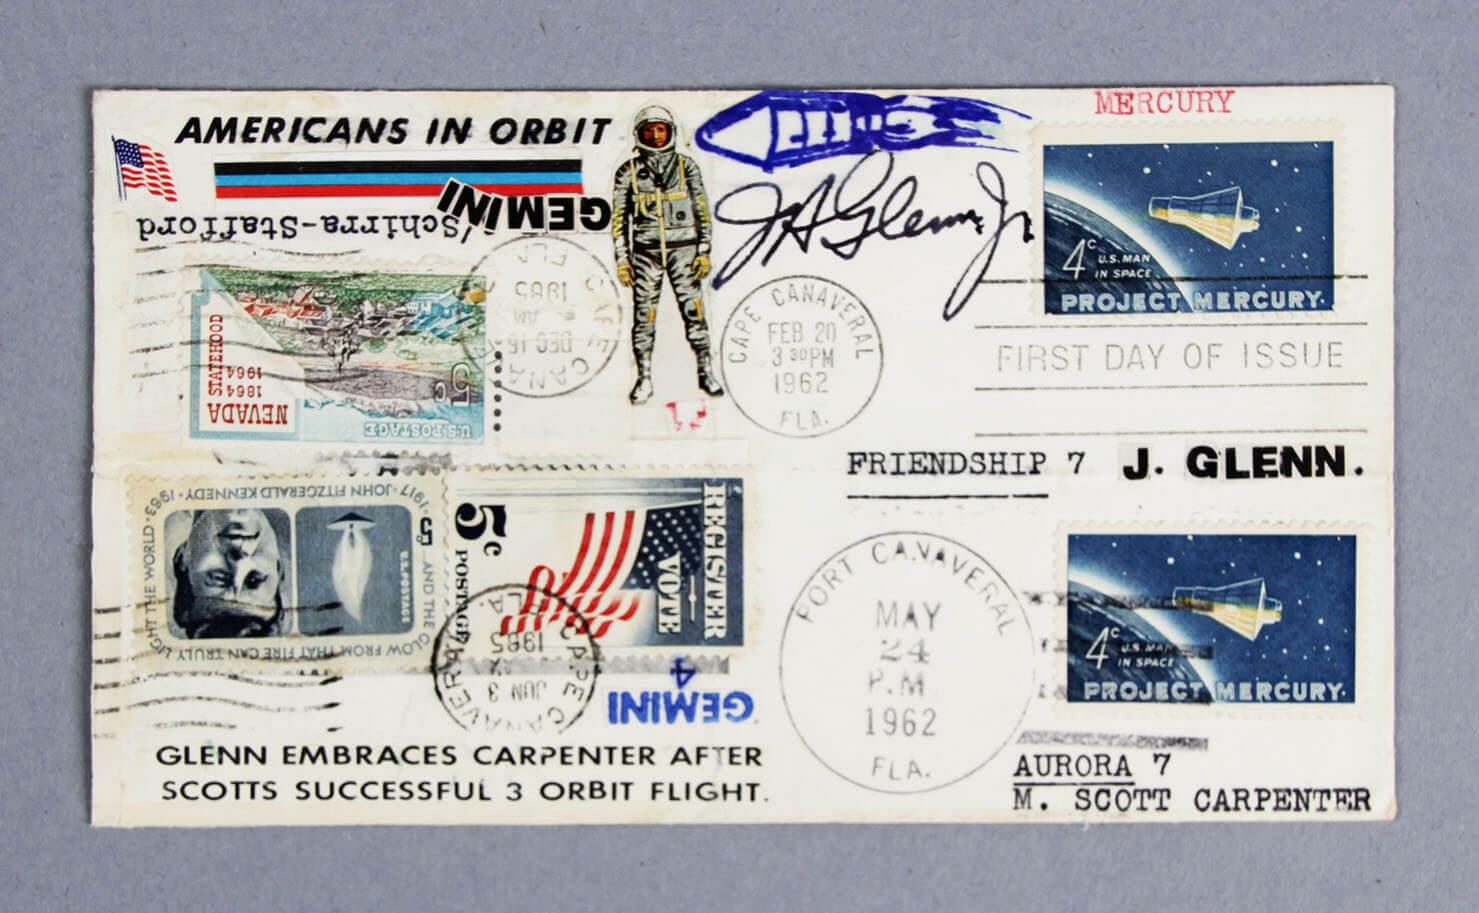 Astronaut John Glenn Signed FDC Cachet (Full Signature) NASA - JSA Full LOA